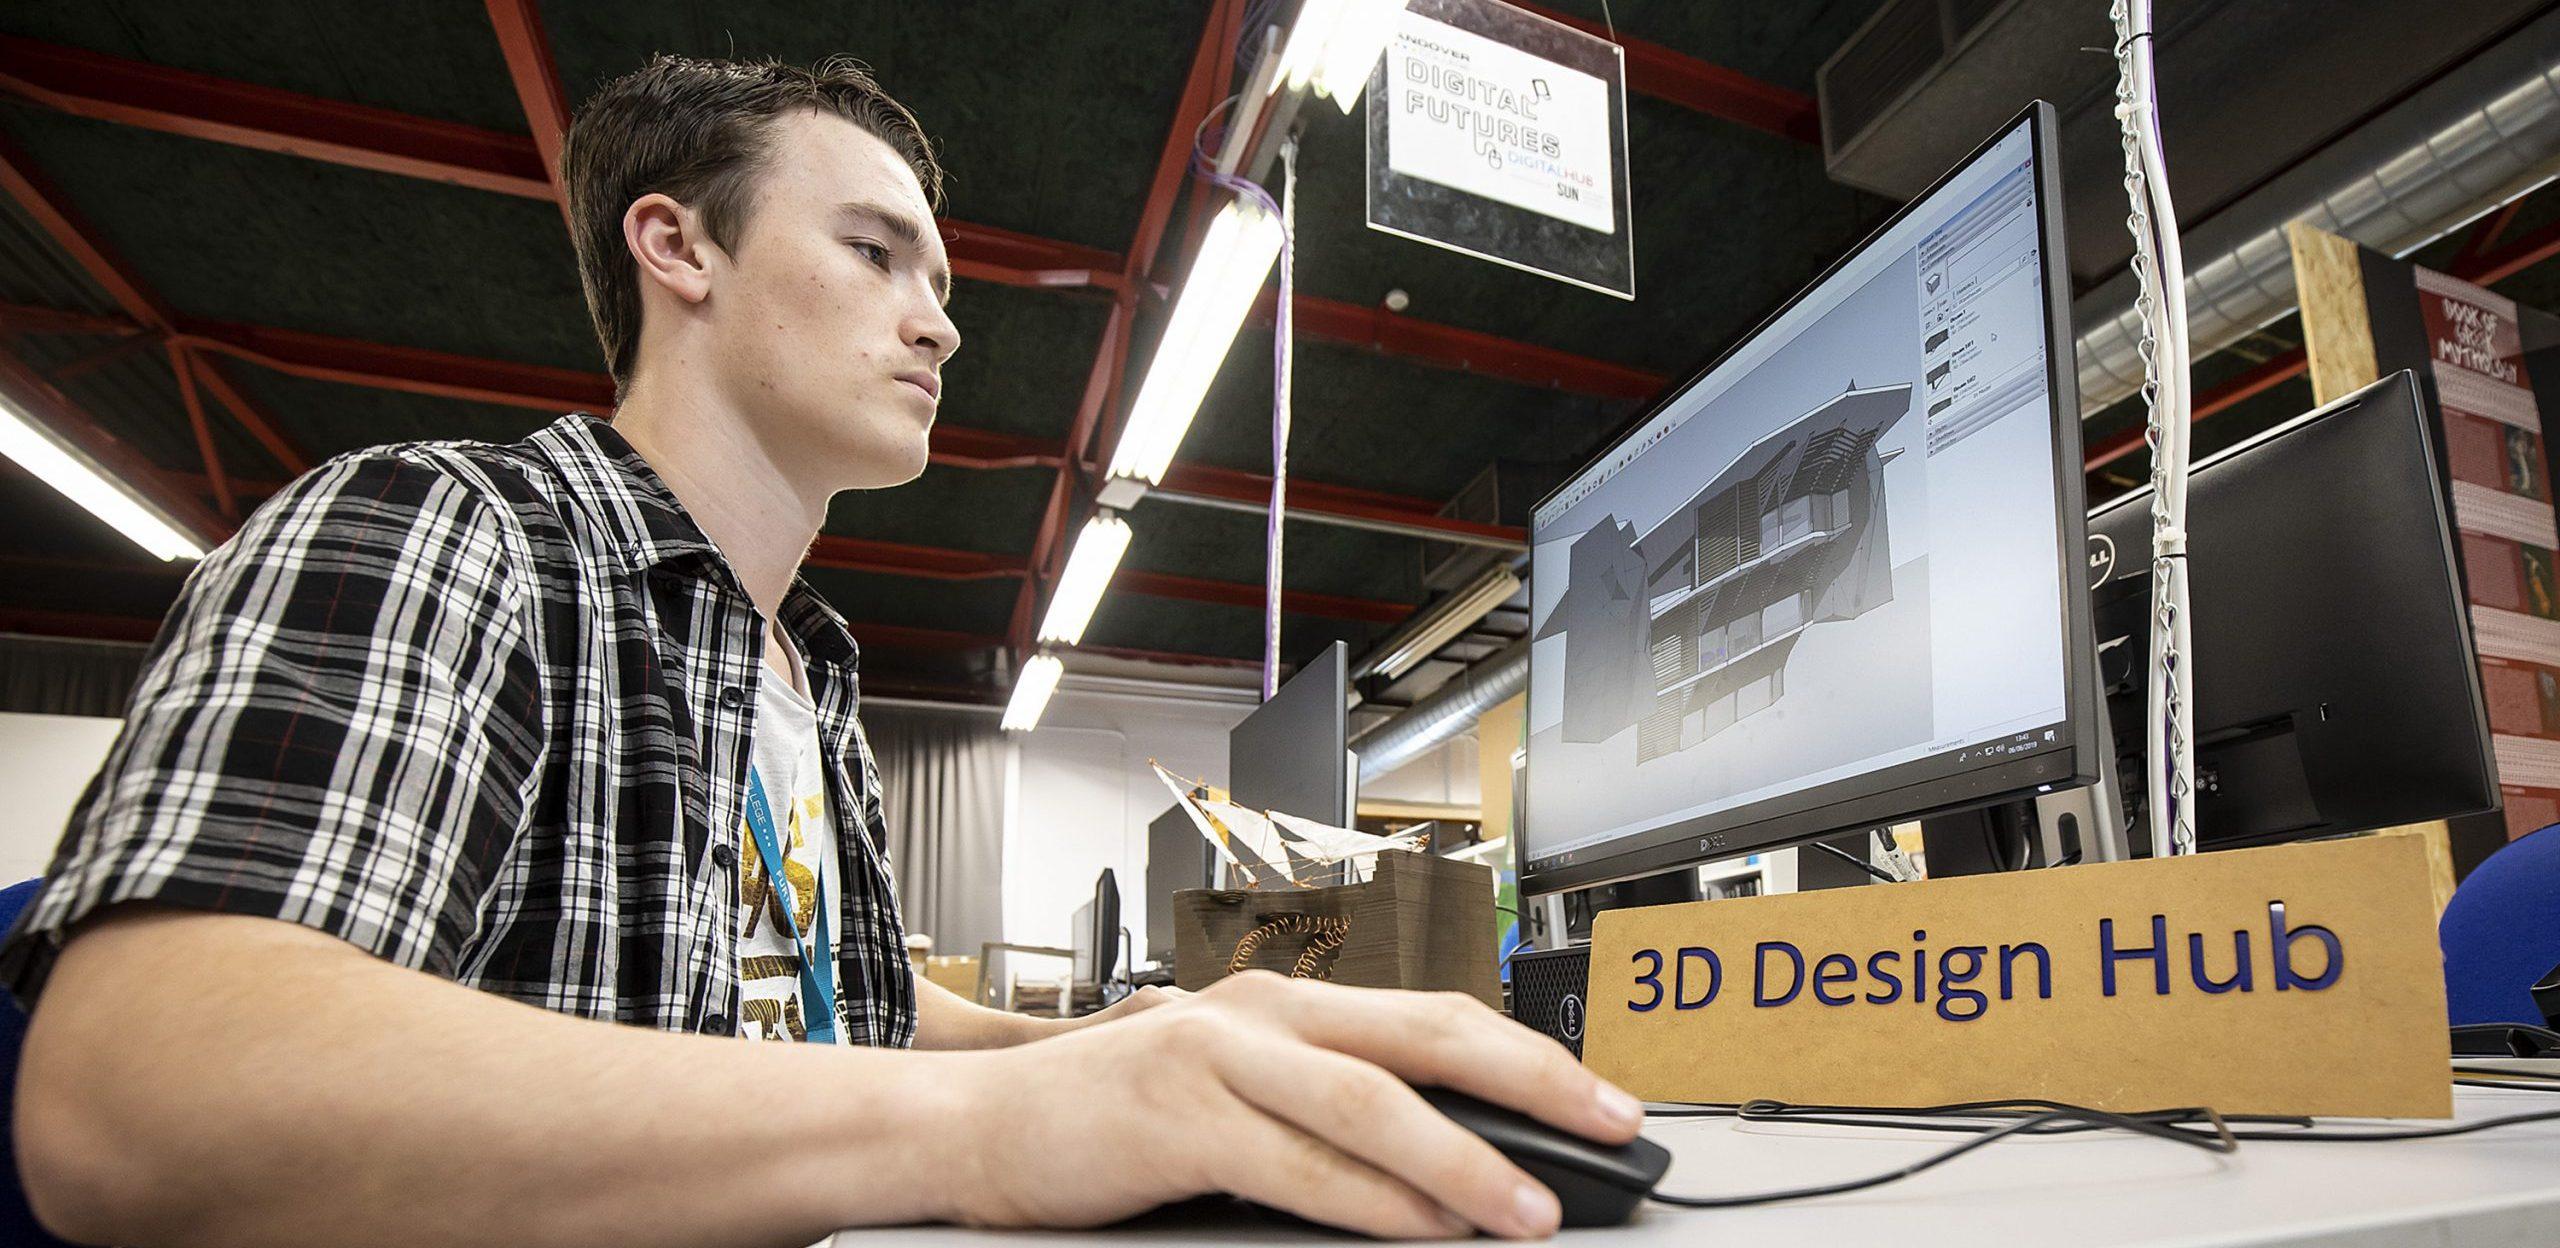 3D Design Hub